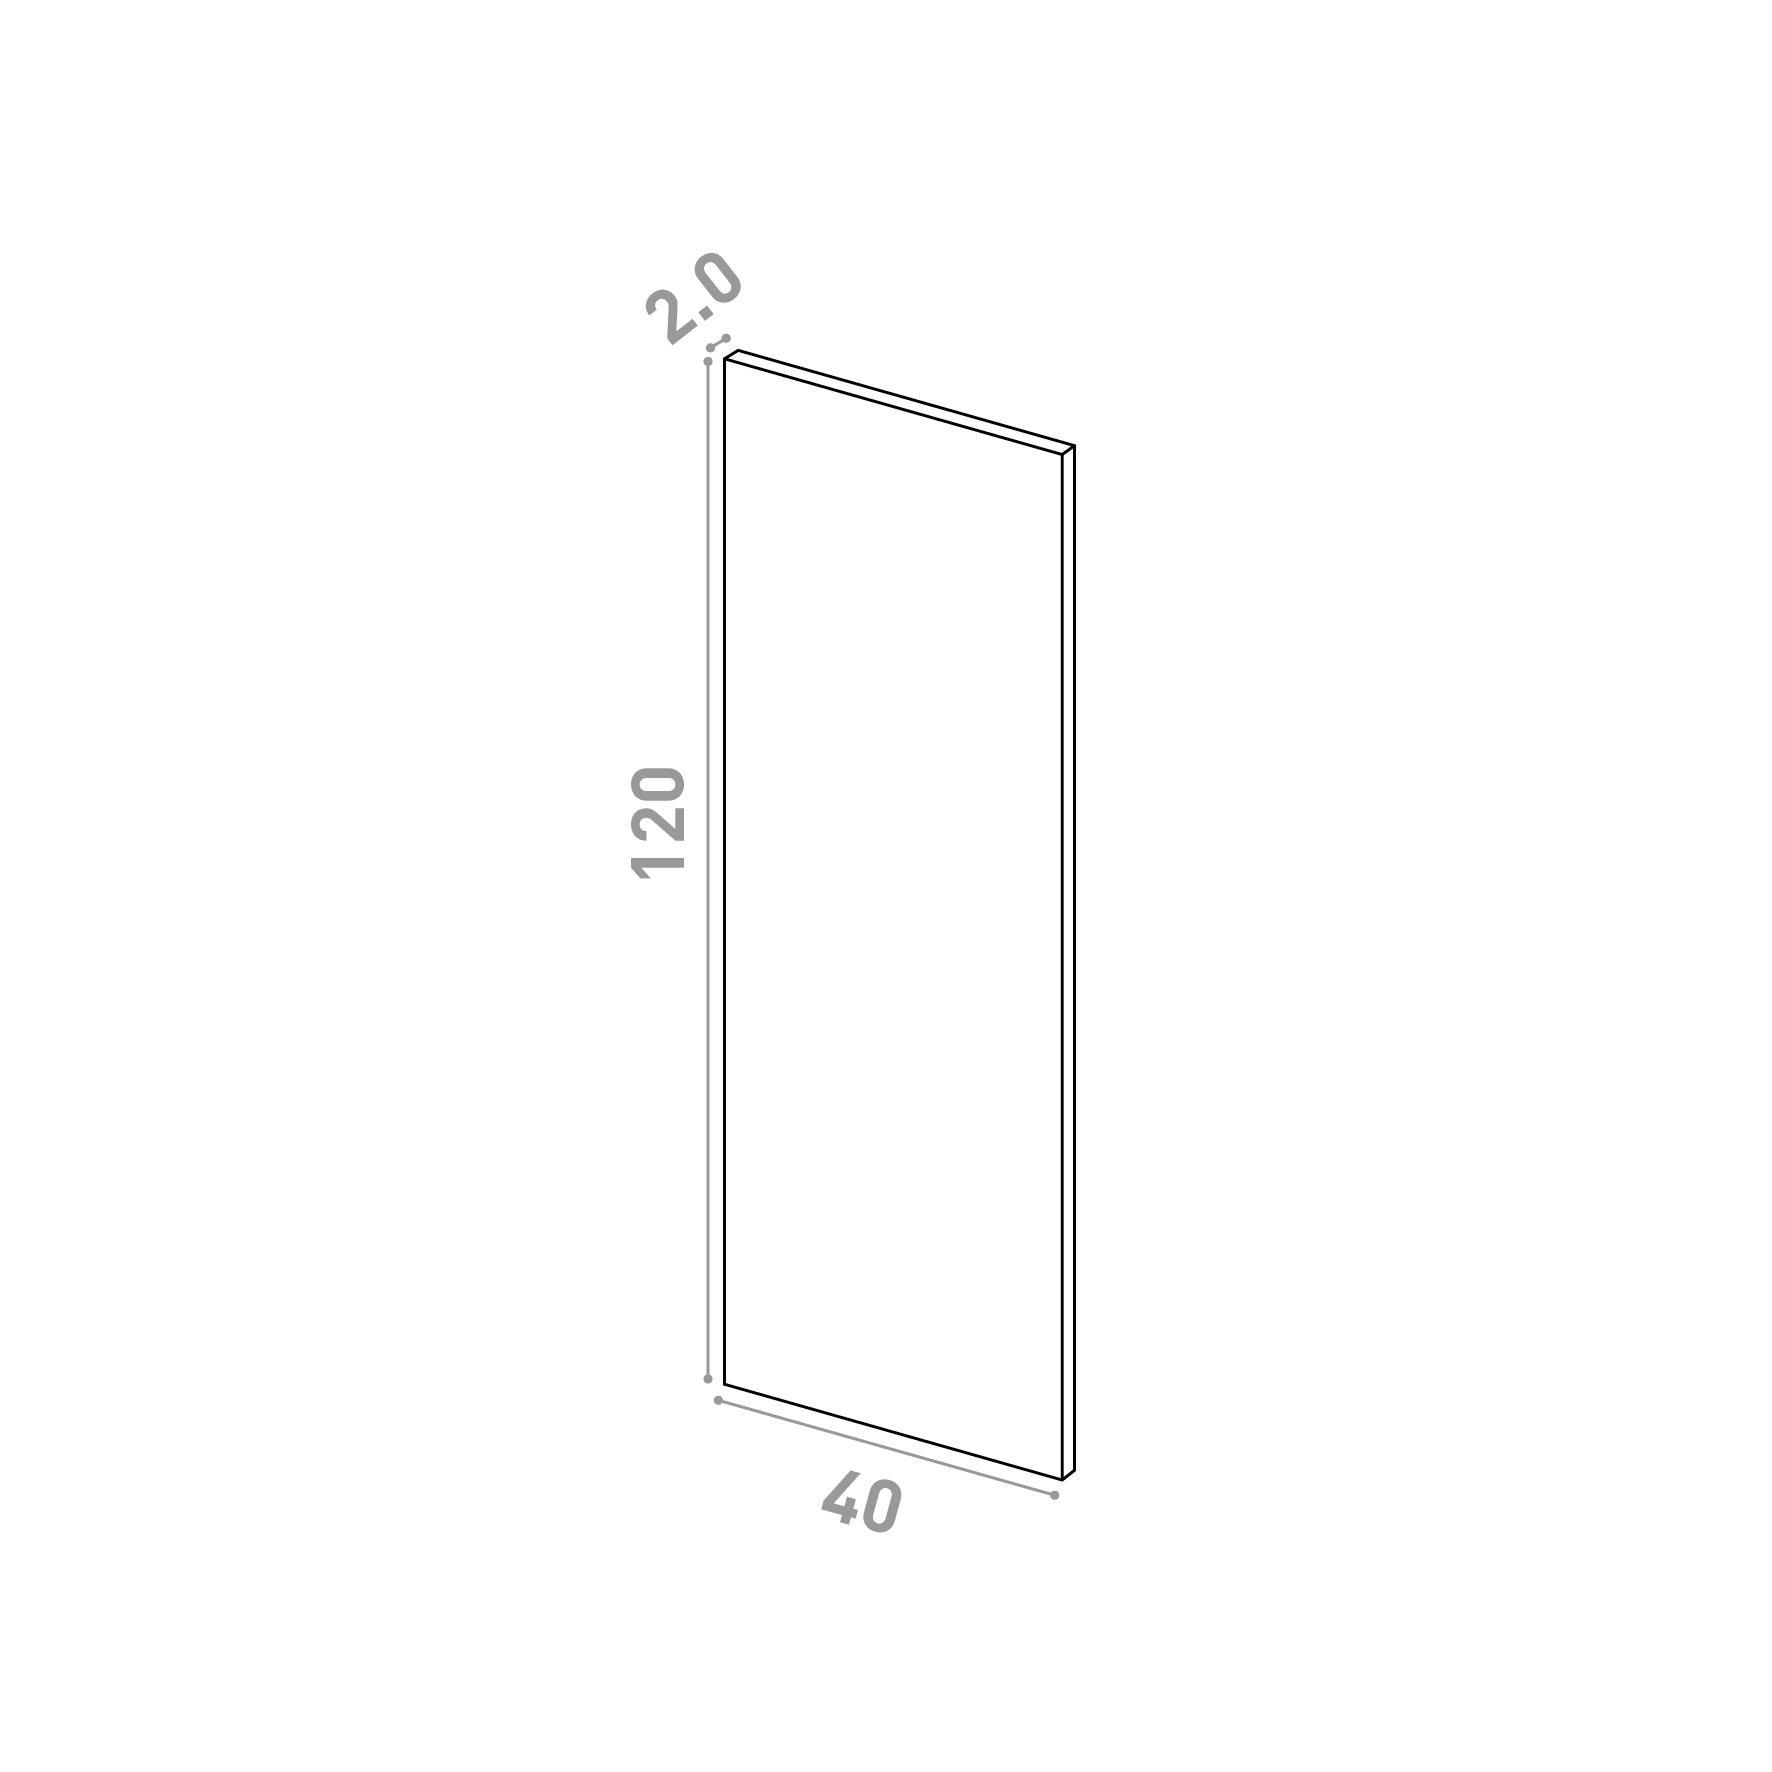 Porte 40X120cm   design lisse   chêne naturel